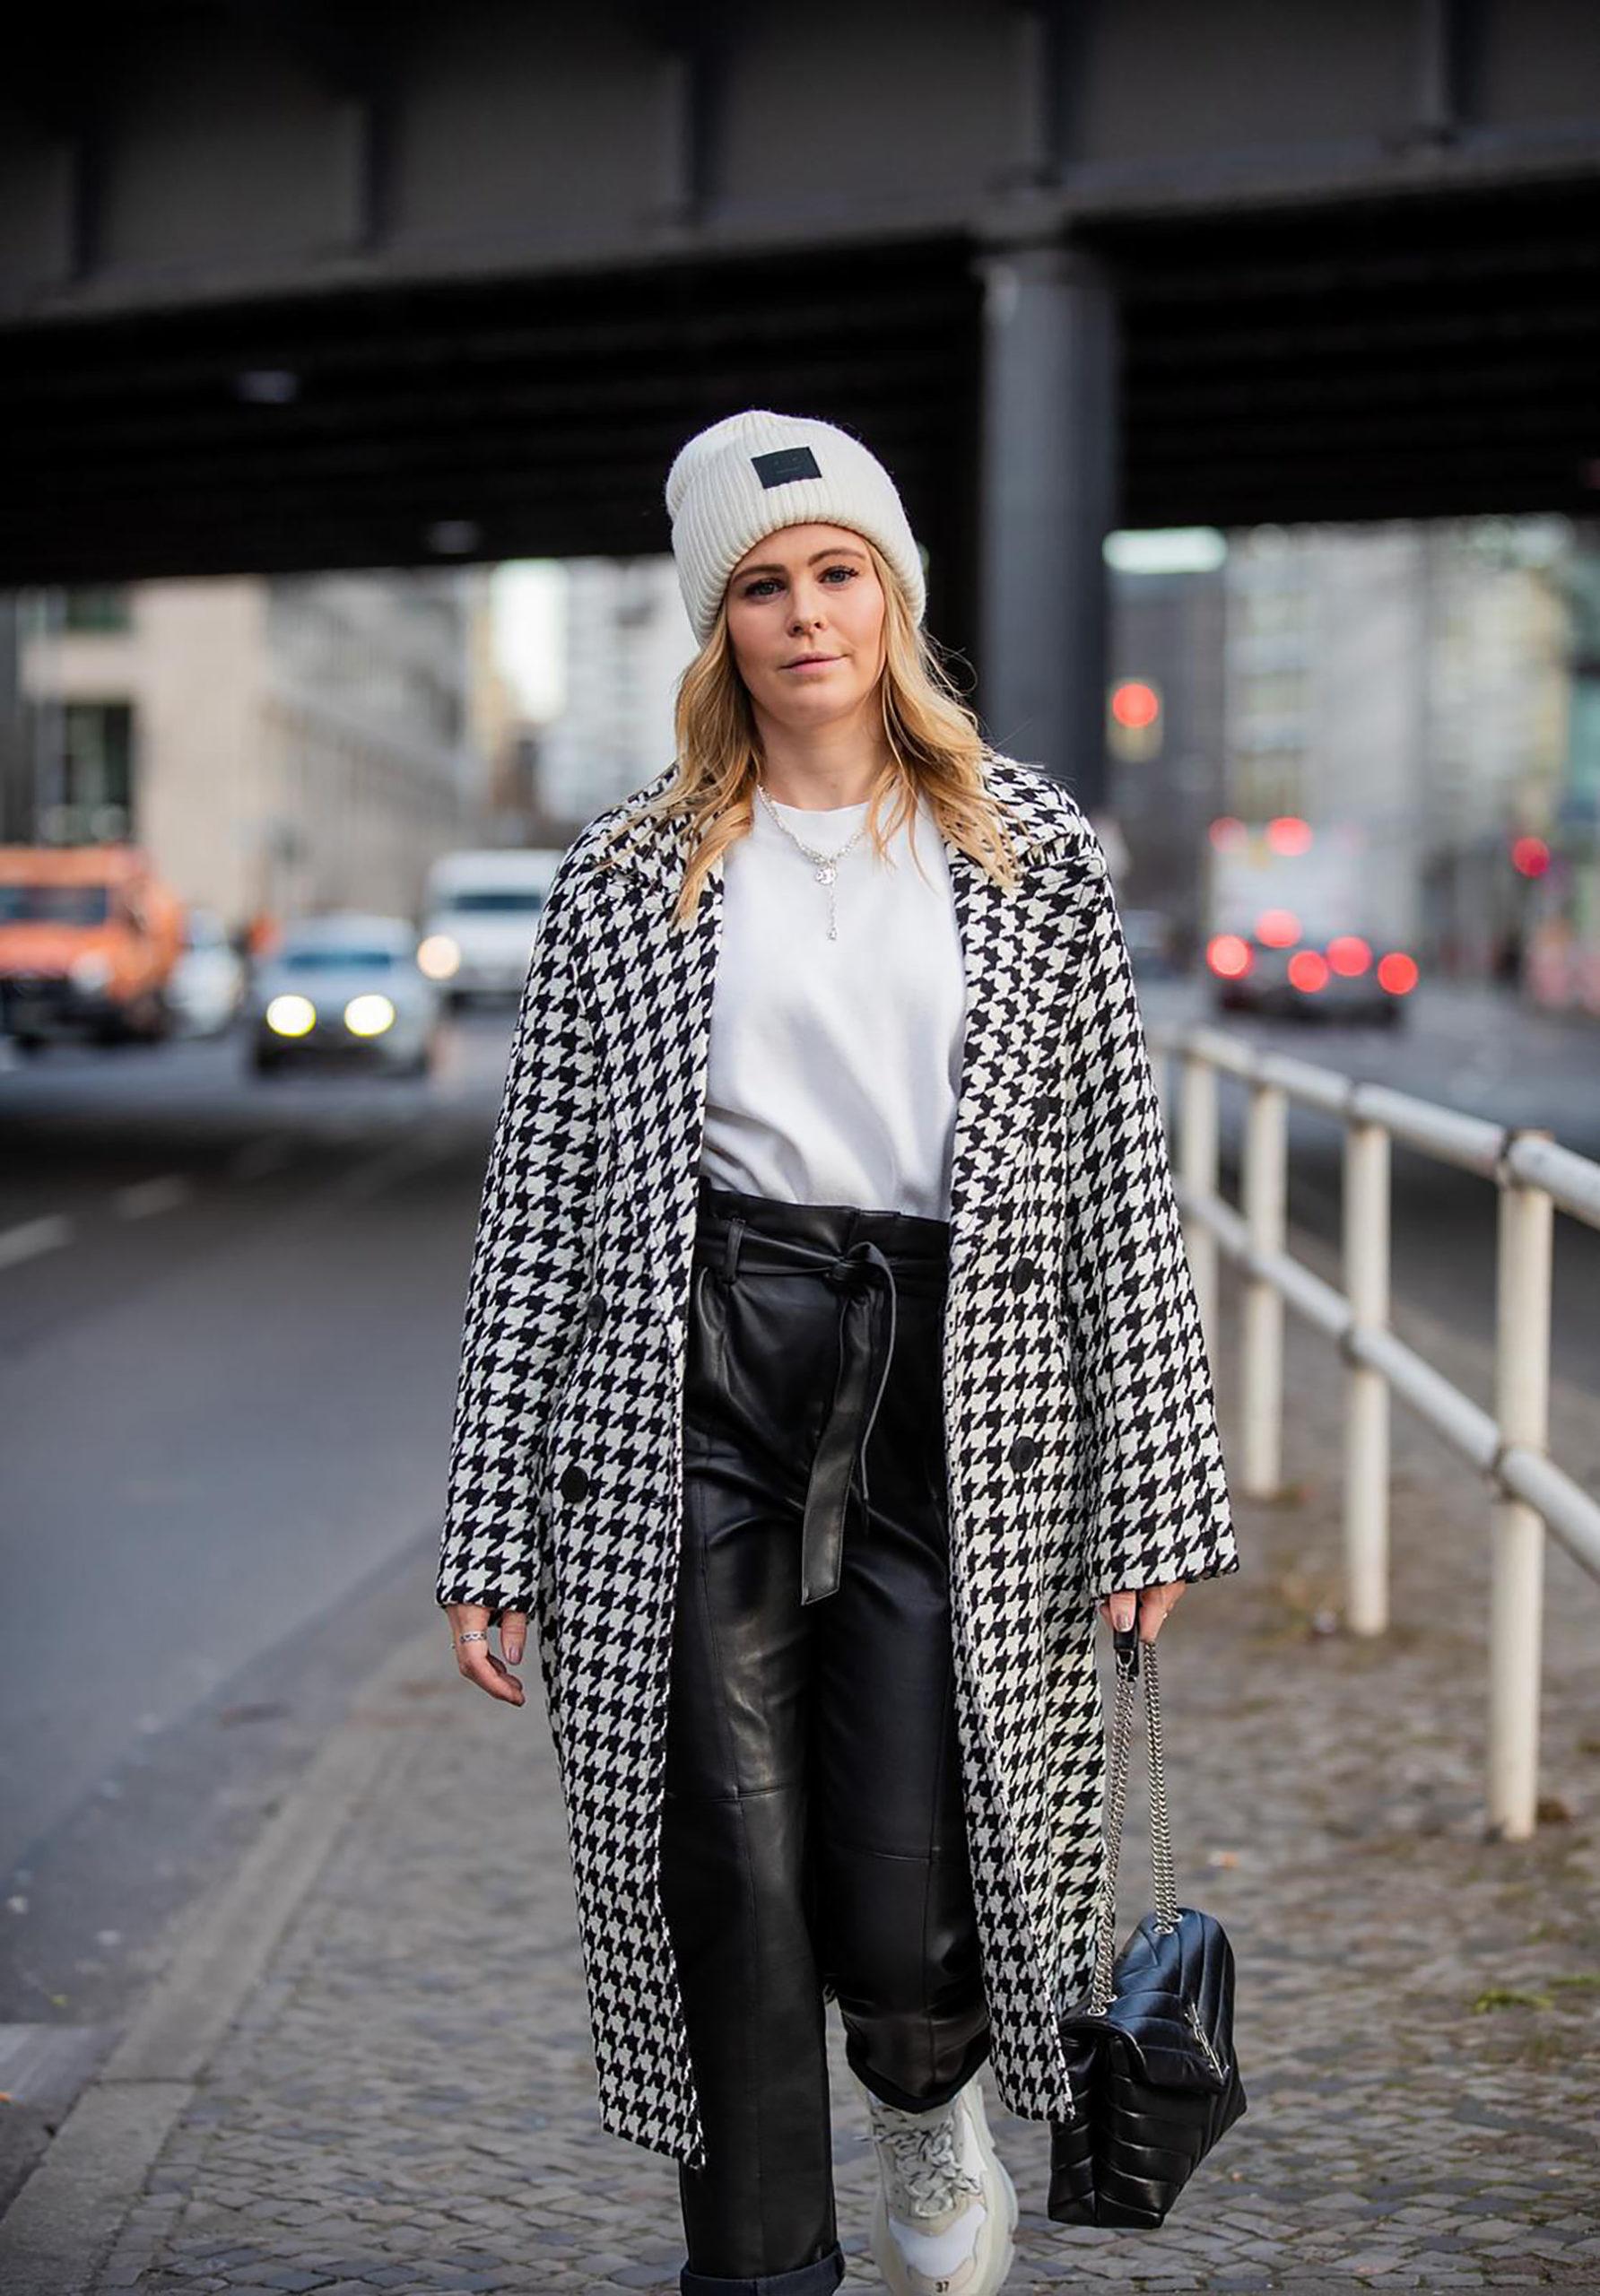 inga brauer street style outfit berlin hahnentritt-mantel